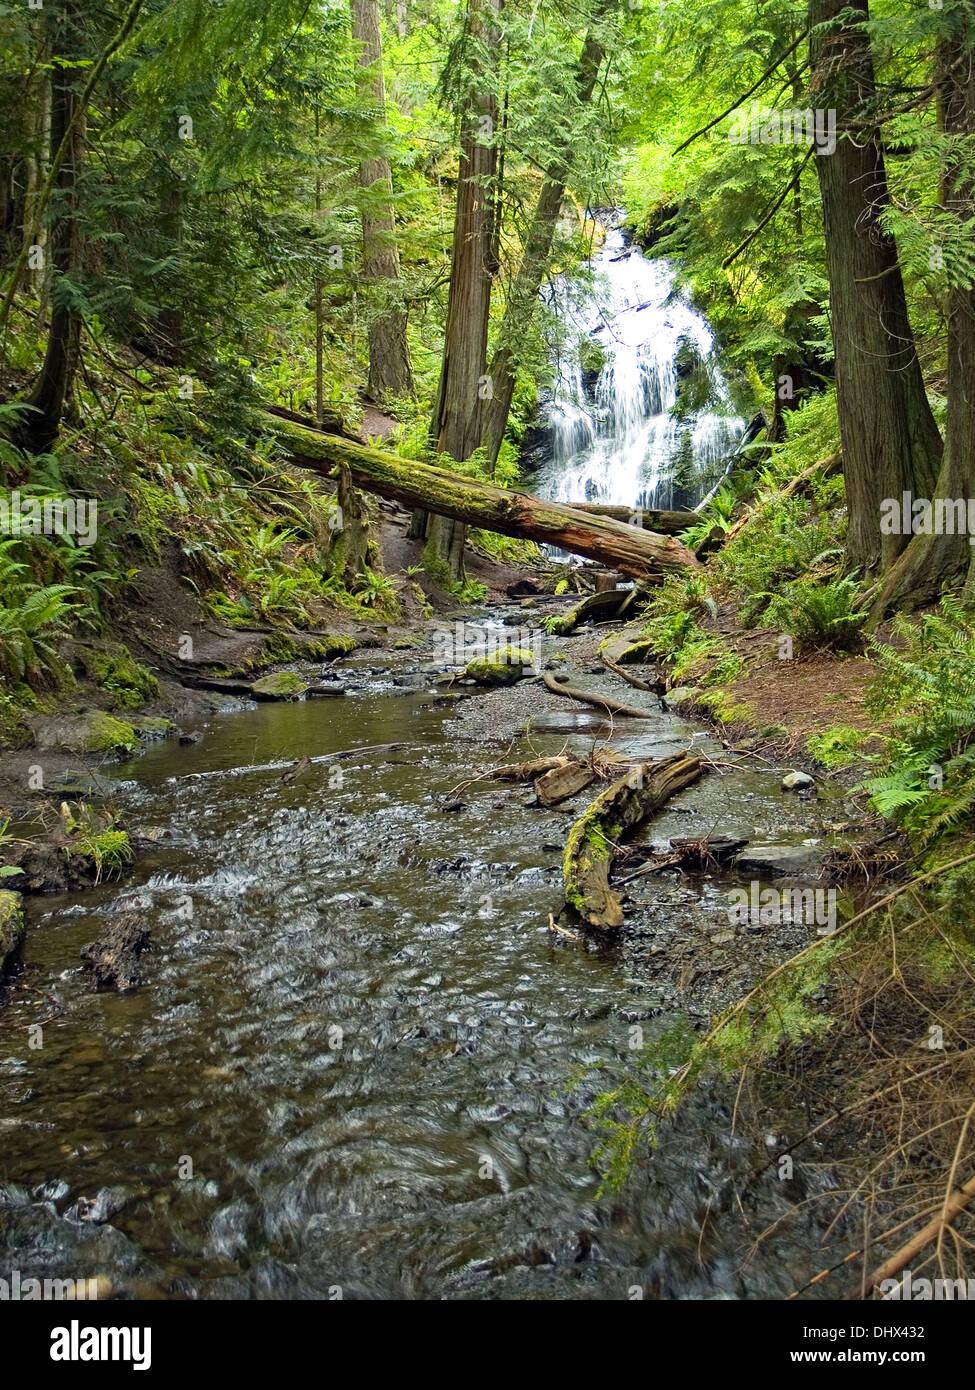 Cascade Falls,Moran State Park,Orcas Island, Washington State - Stock Image